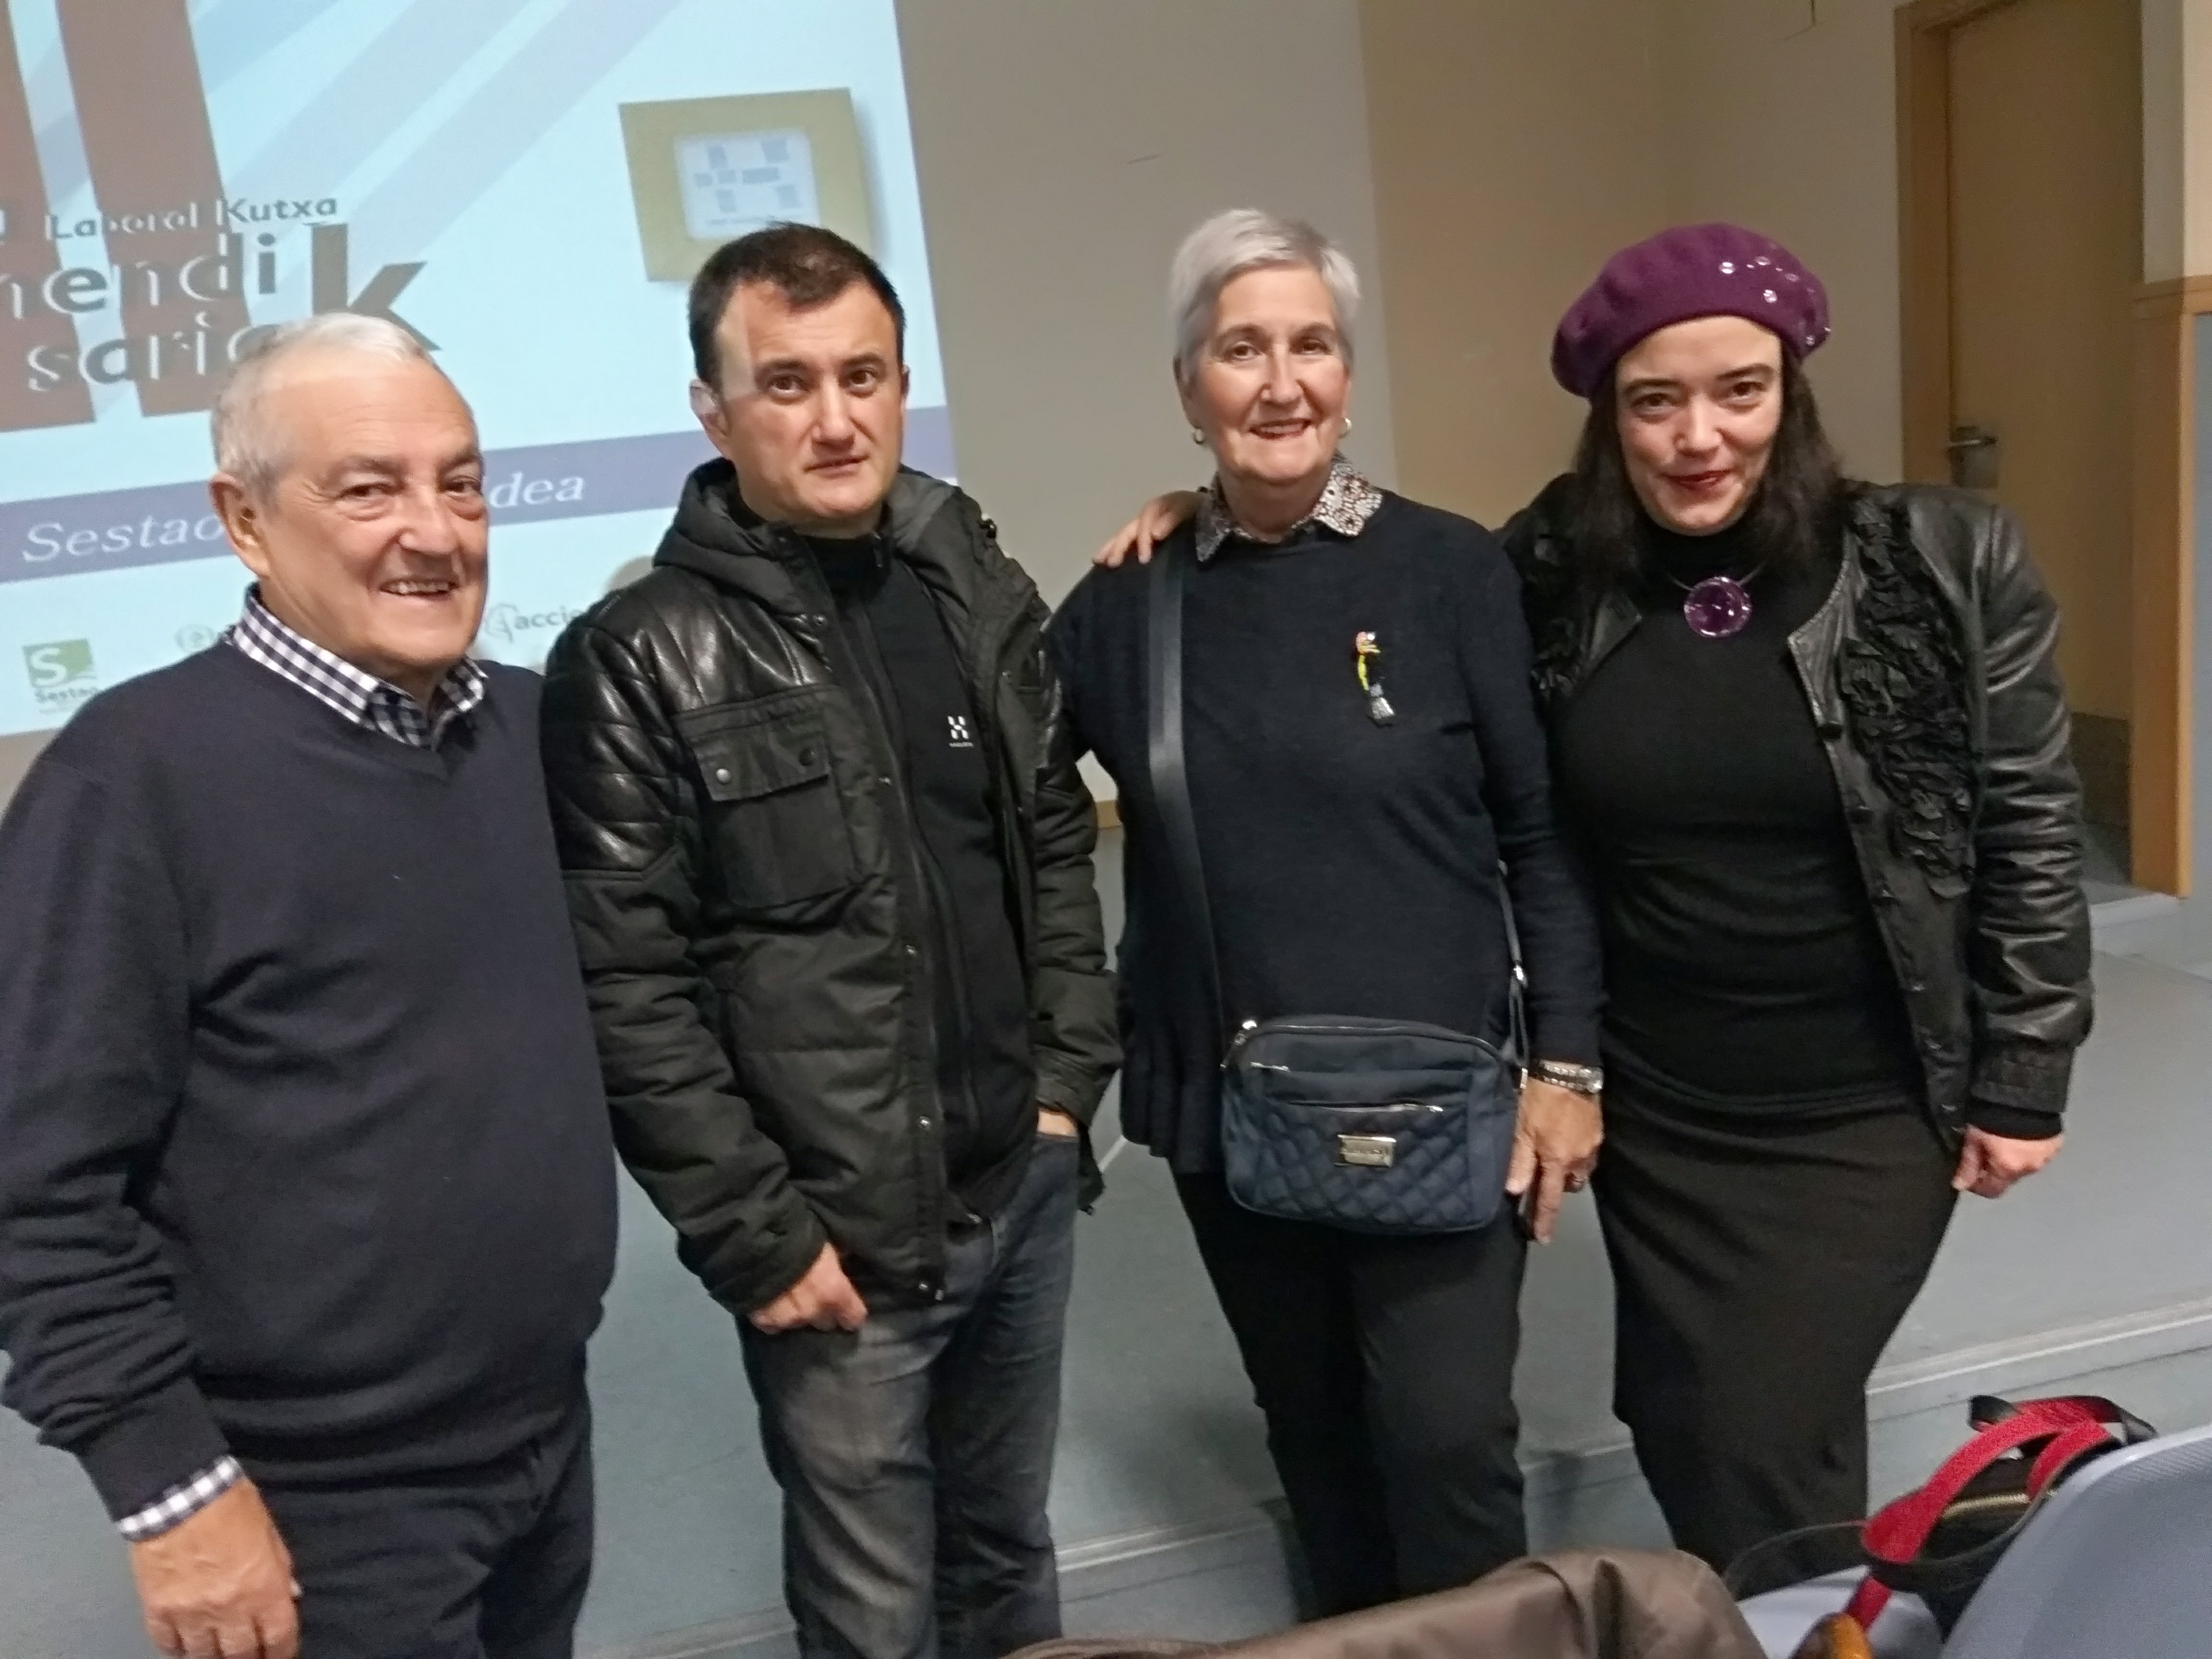 Txema y David Lorente, Agustina Fernández e Itxaso Tellaetxe (parte del equipo SOS AMATXU)